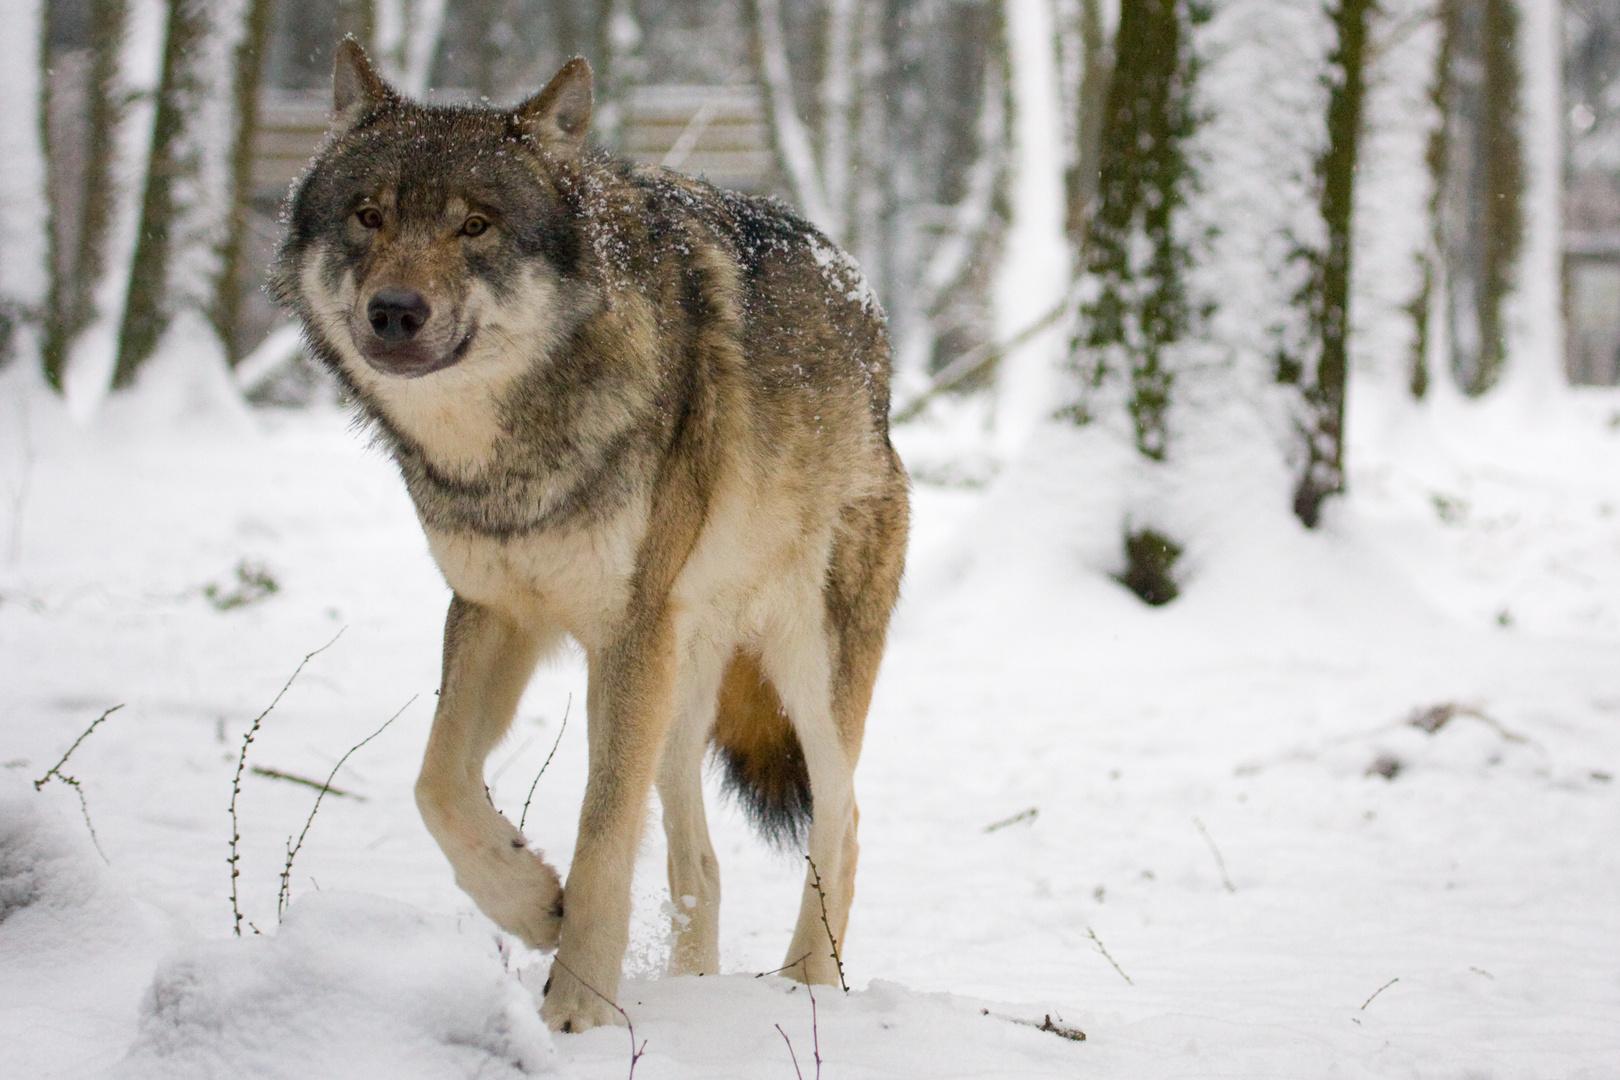 Wölfin auf Streife